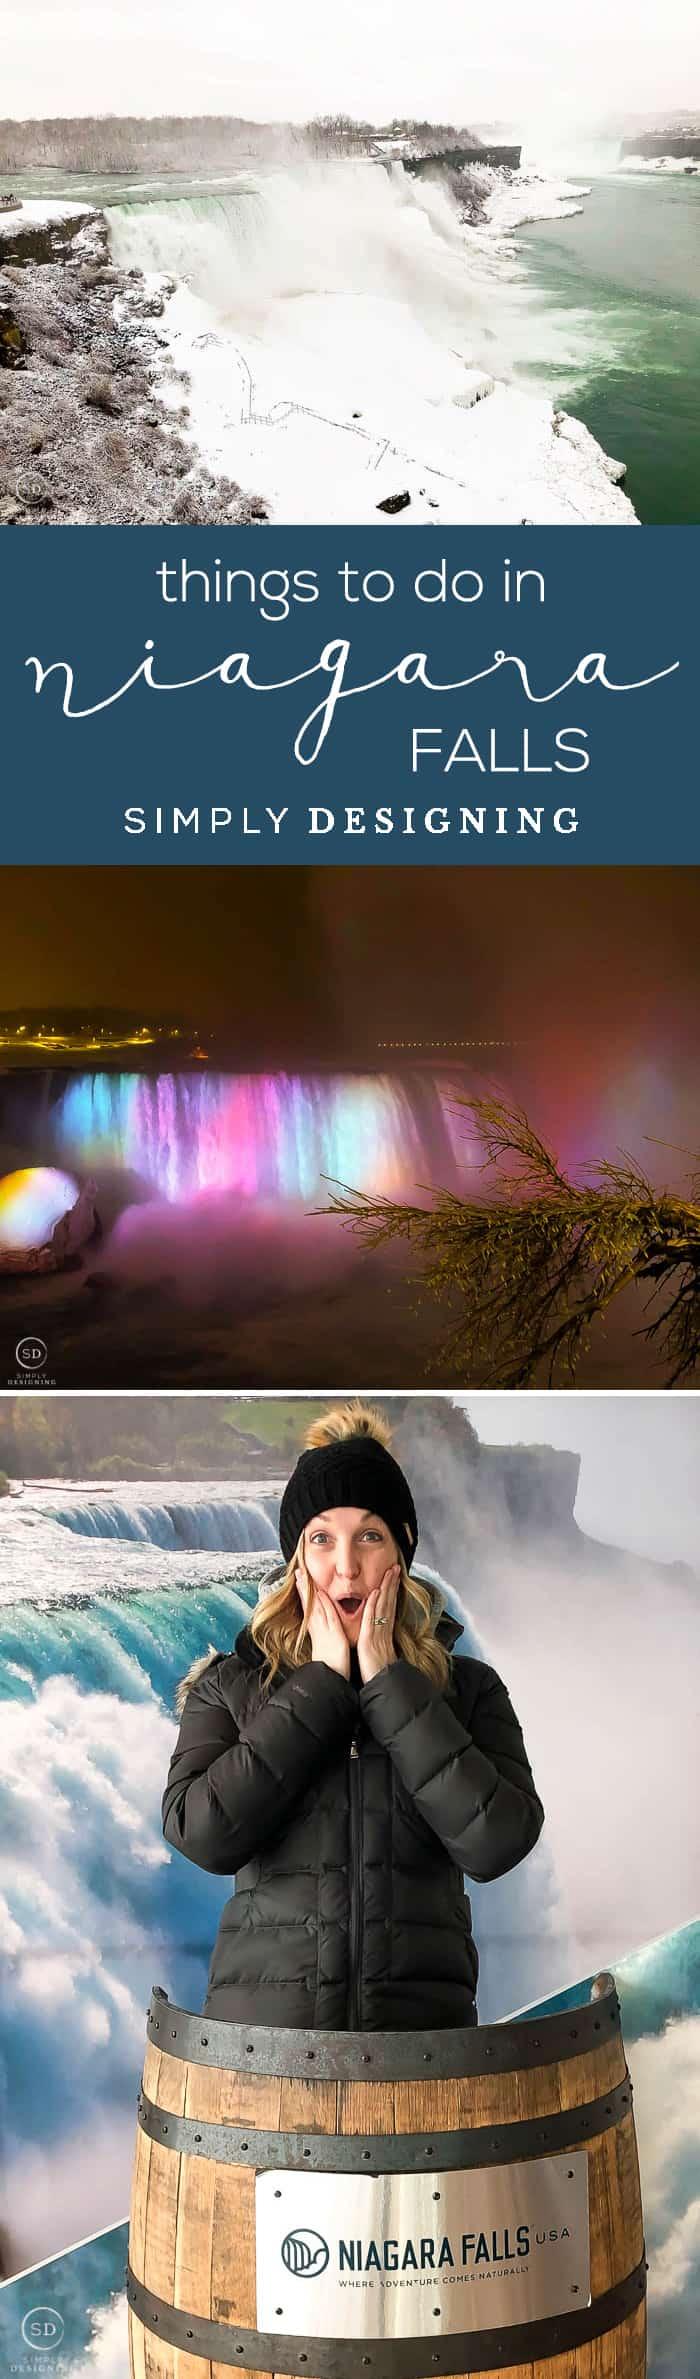 Things to do in Niagara Falls - I am sharing what to do in Niagara Falls during any time of year - kid friendly things to do at niagara falls